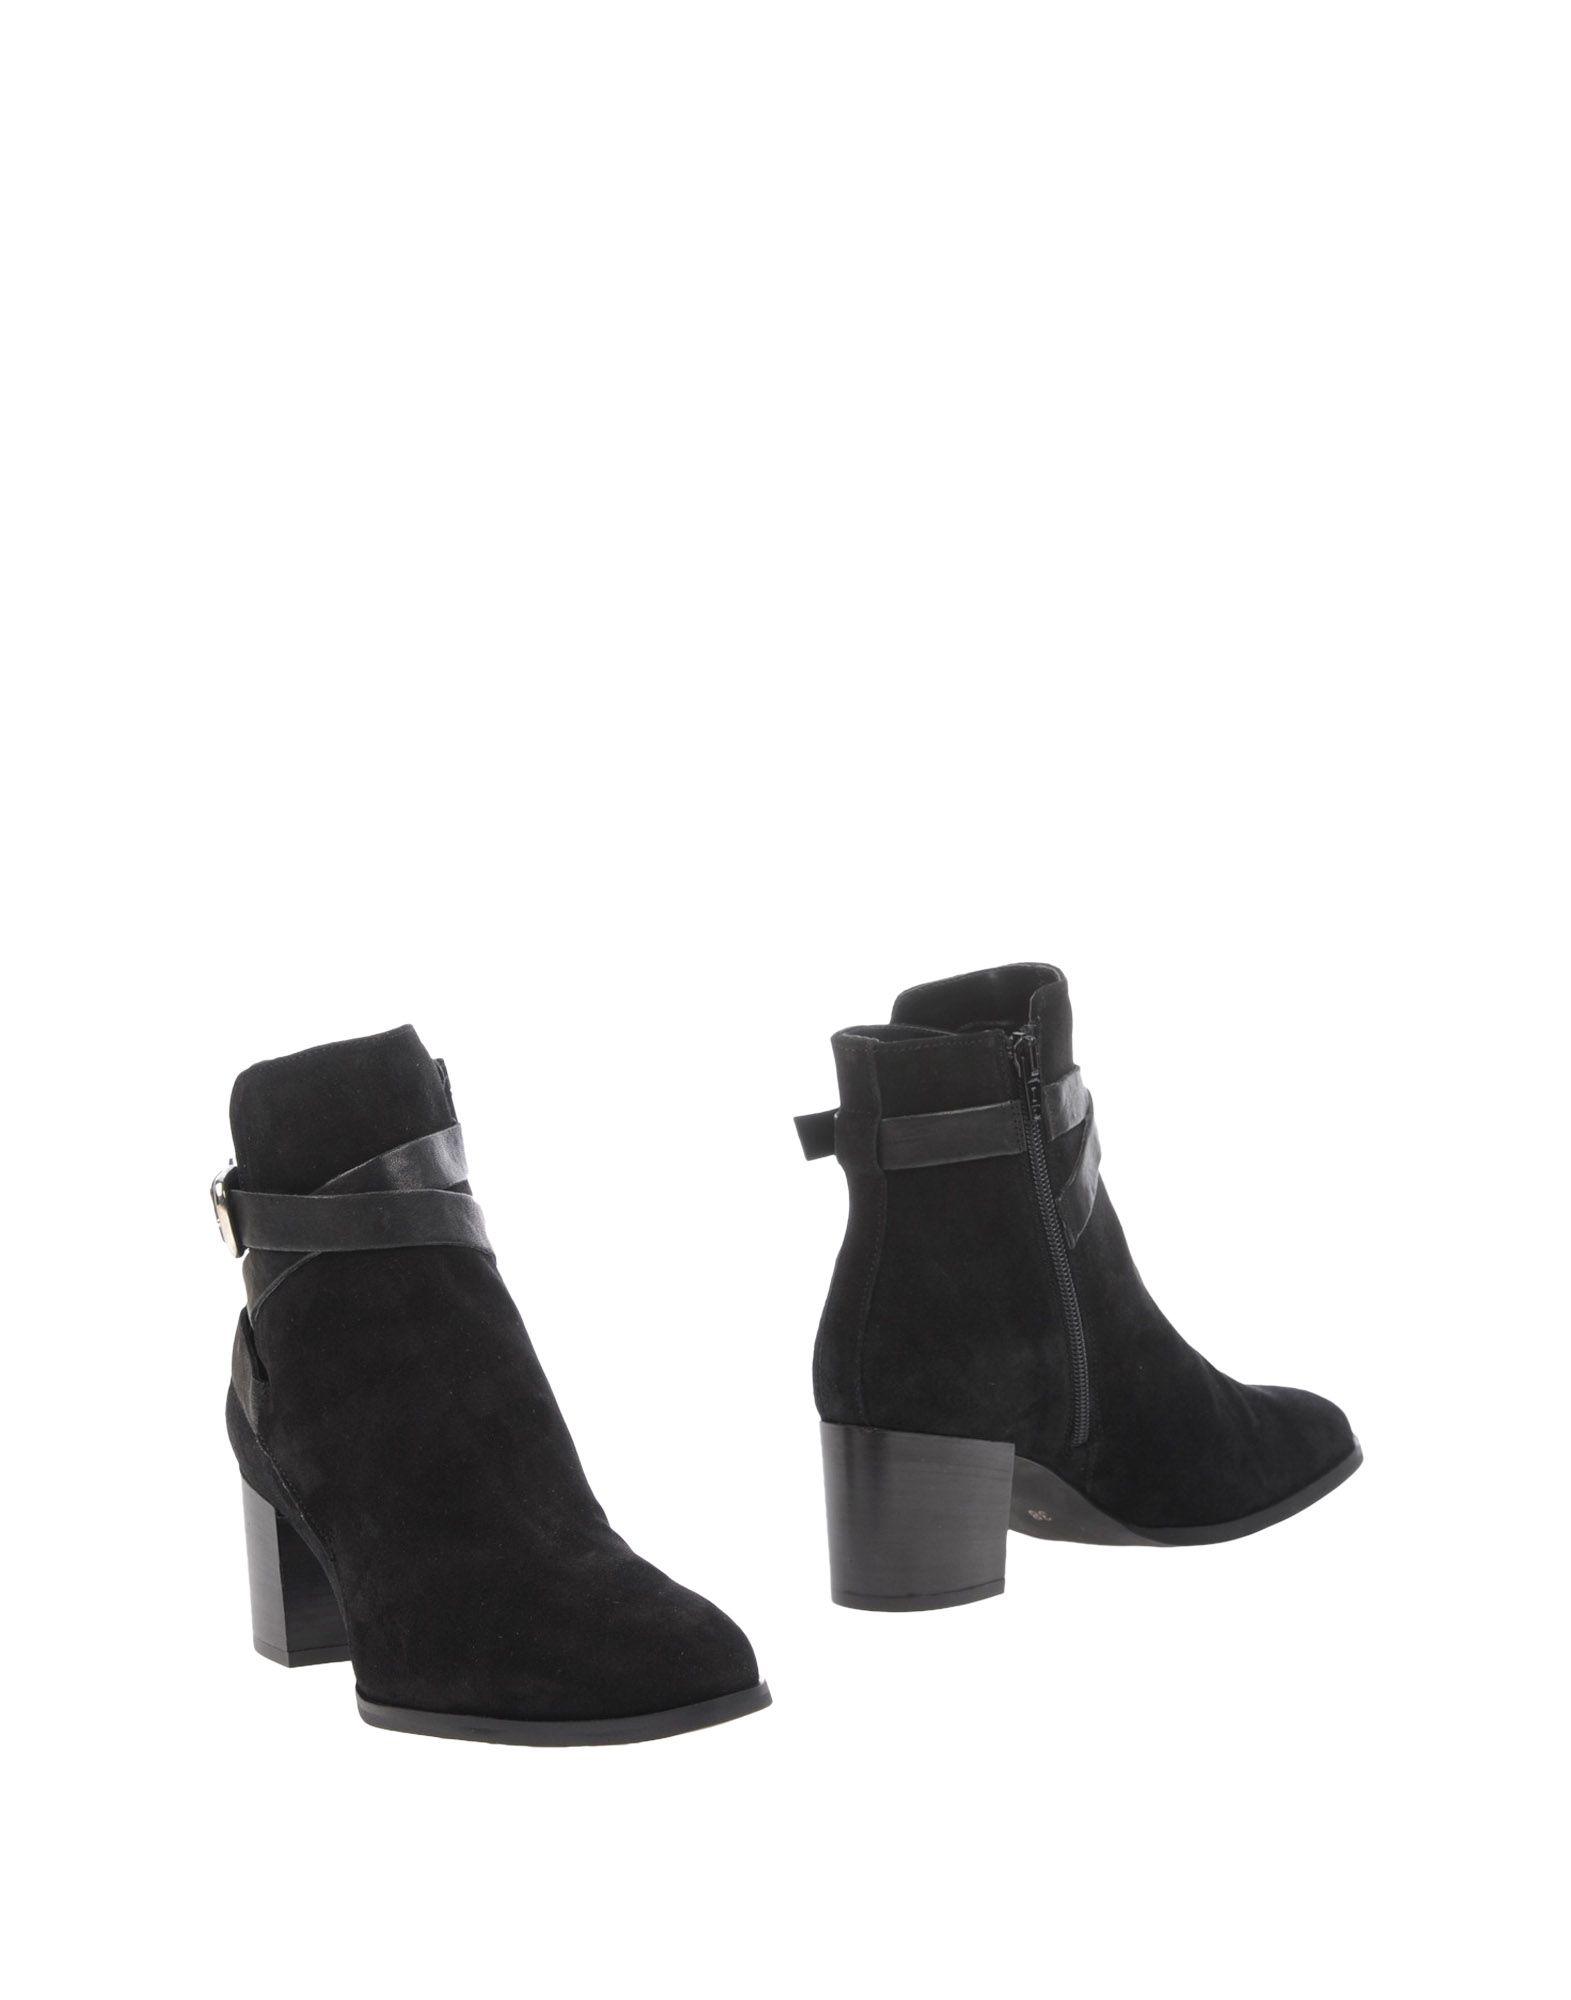 Paola Ferri Stiefelette Damen  11225932BI Gute Qualität beliebte Schuhe